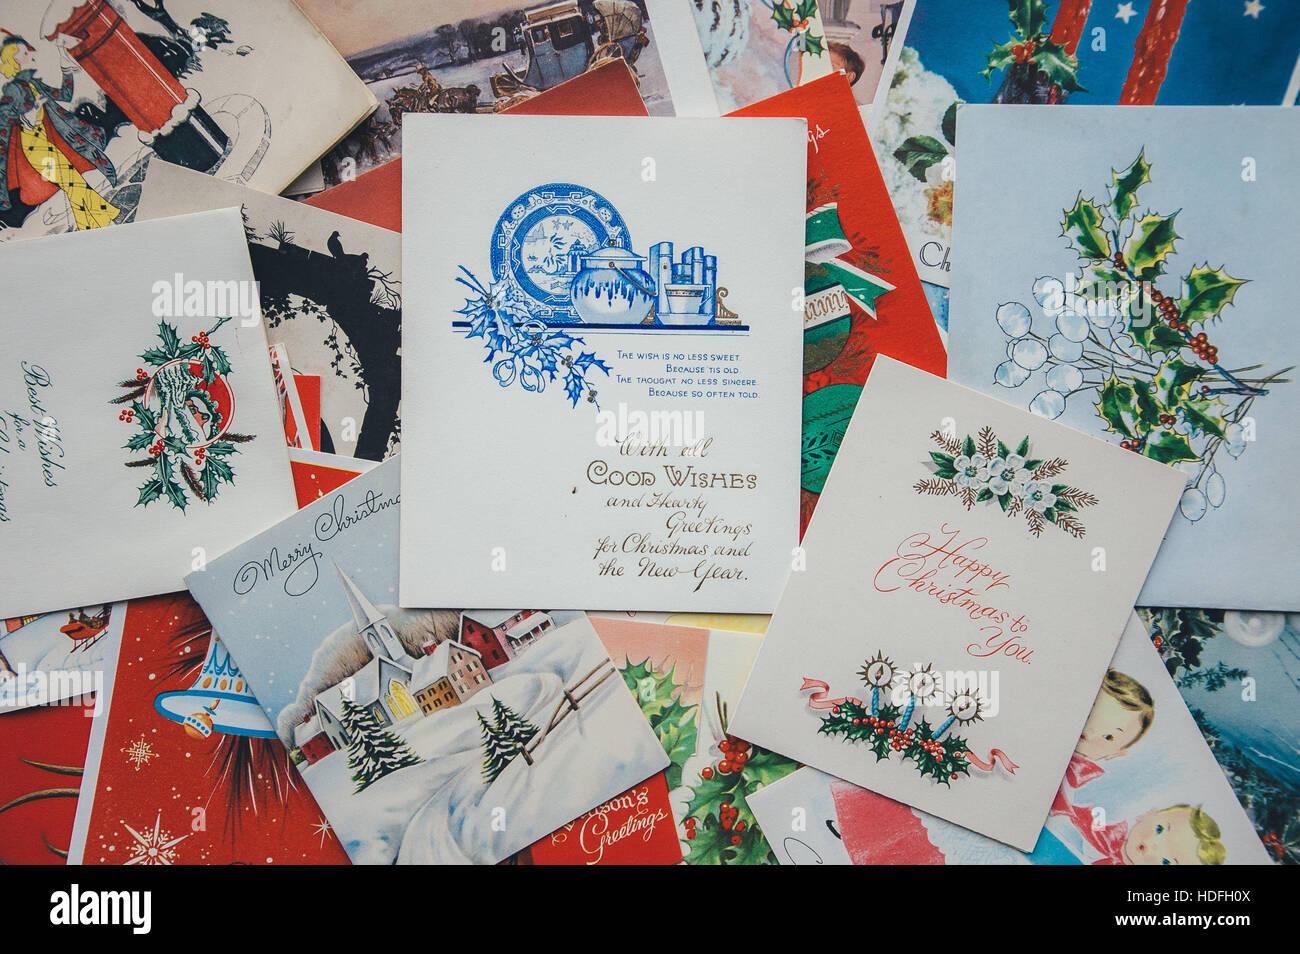 Retro Christmas Cards Stock Photos & Retro Christmas Cards Stock ...